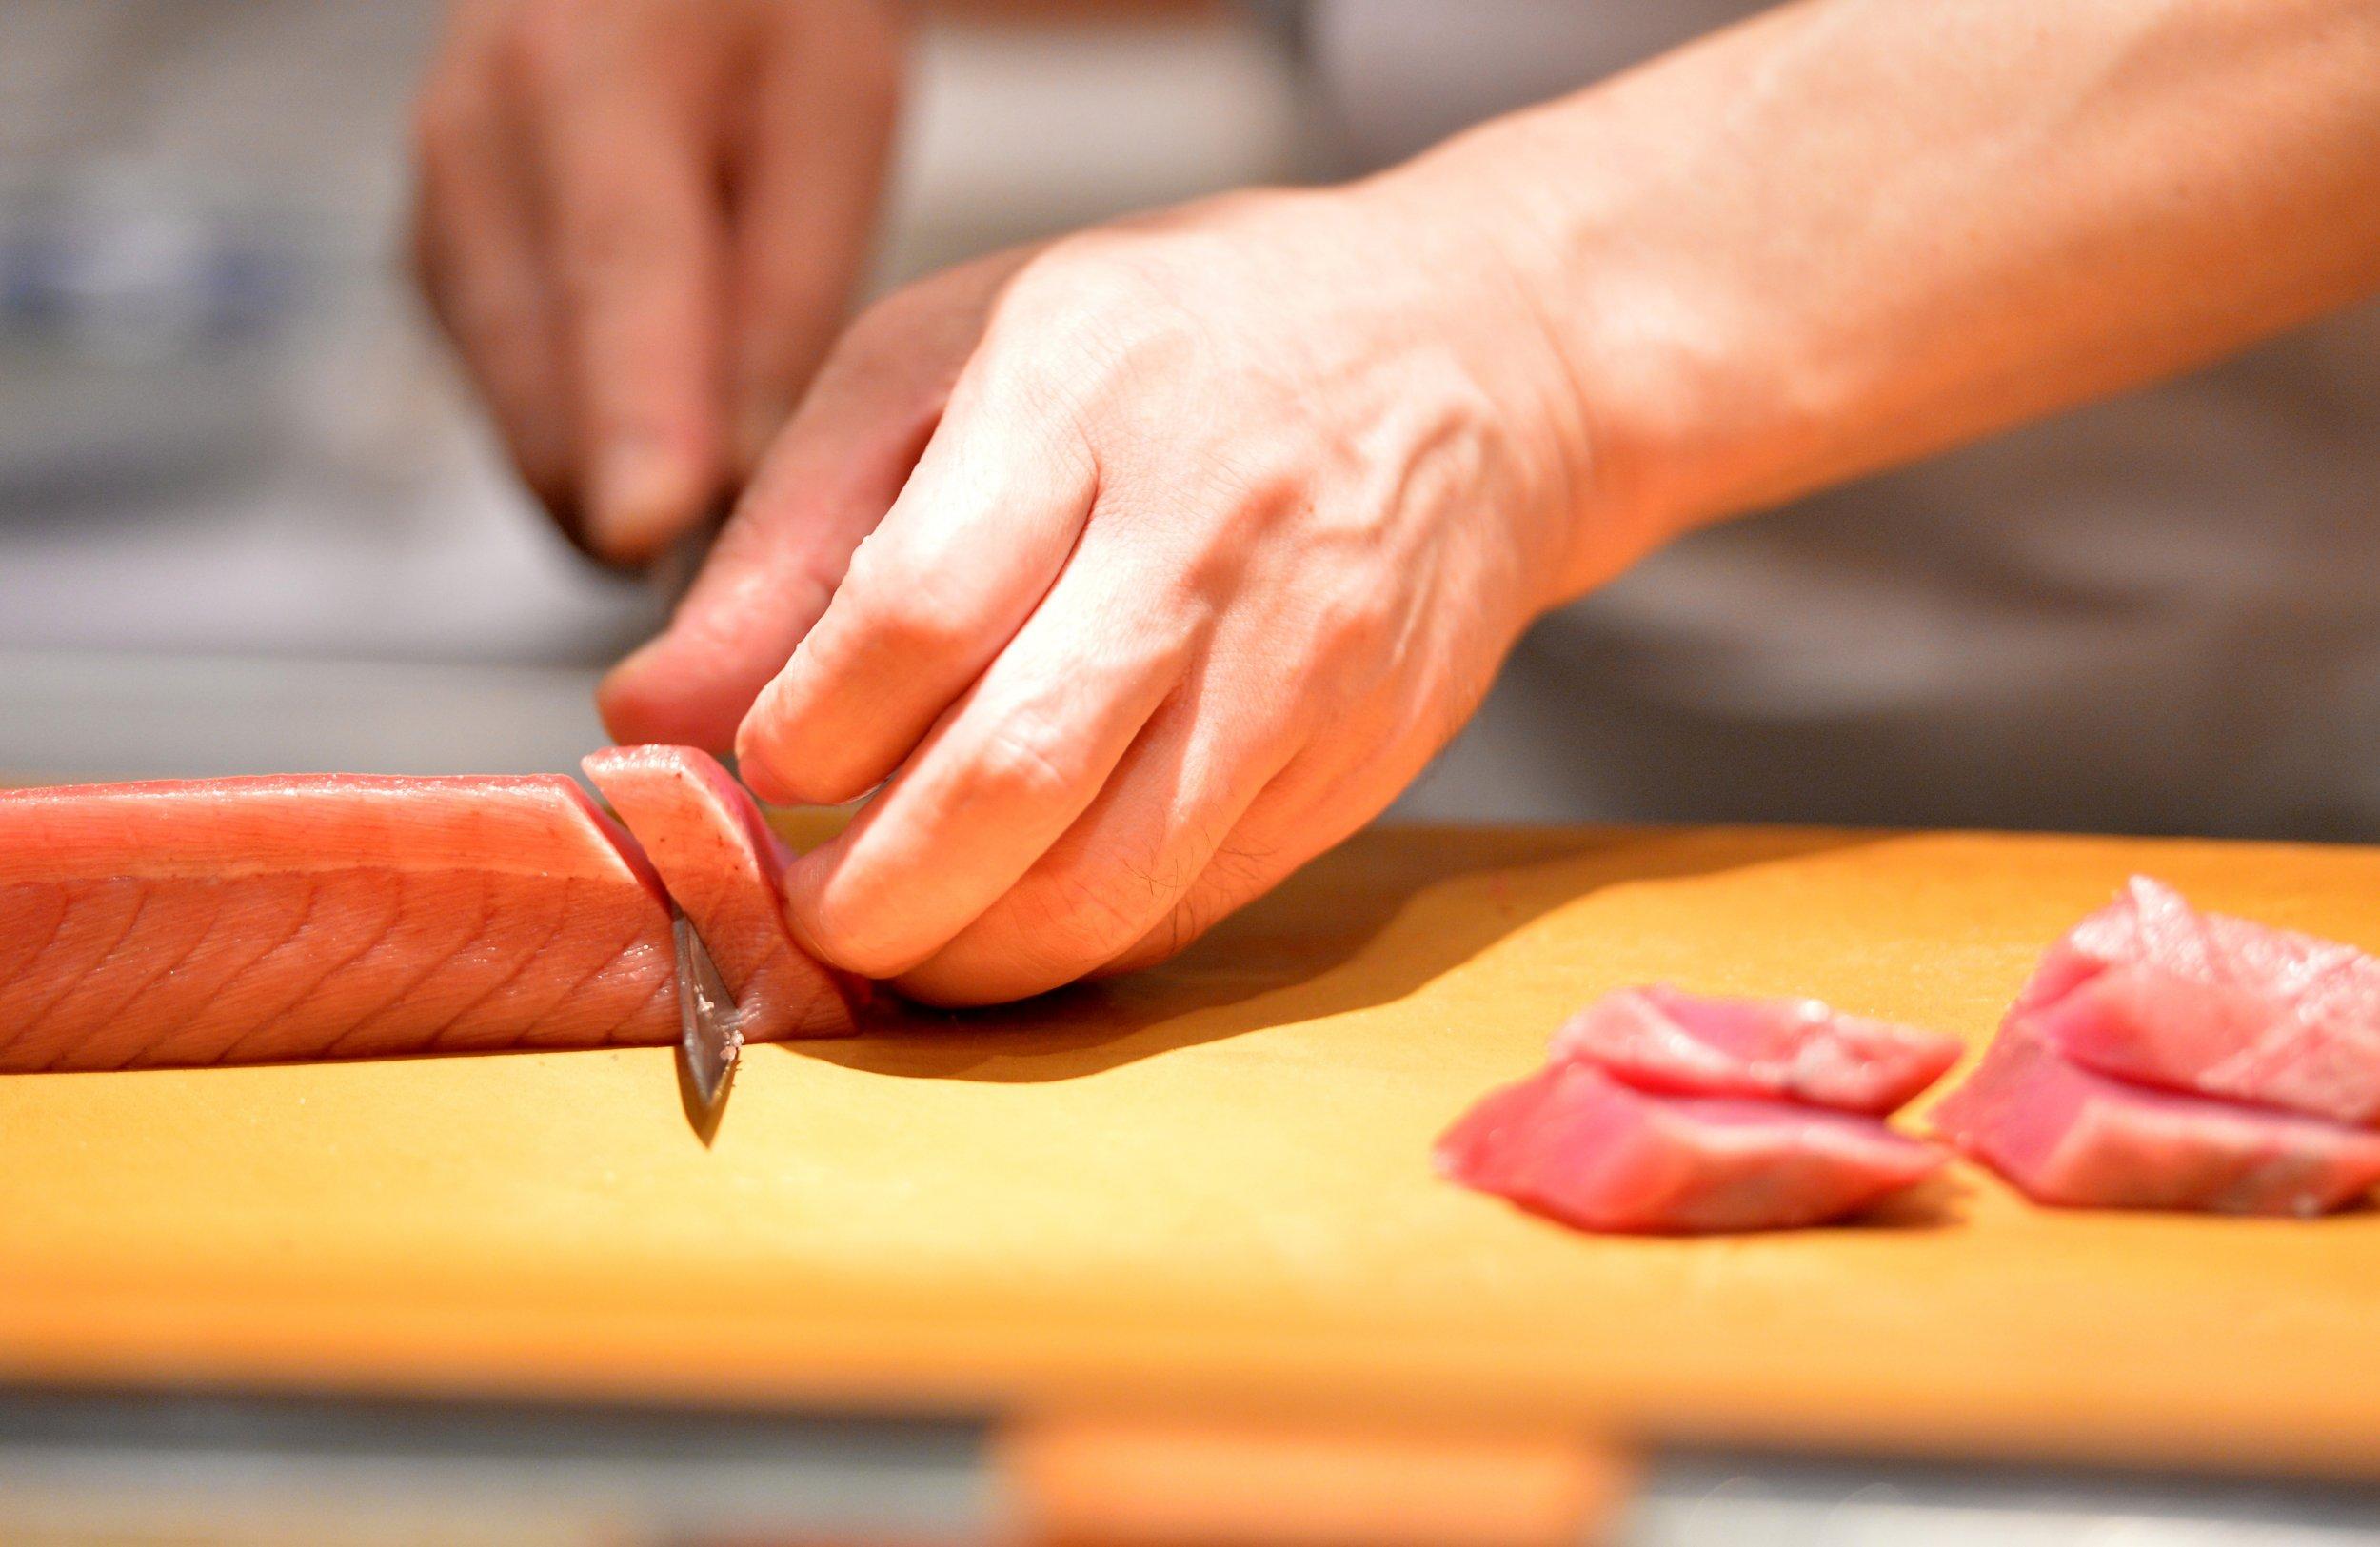 Tuna Outbreak Linked to Salmonella